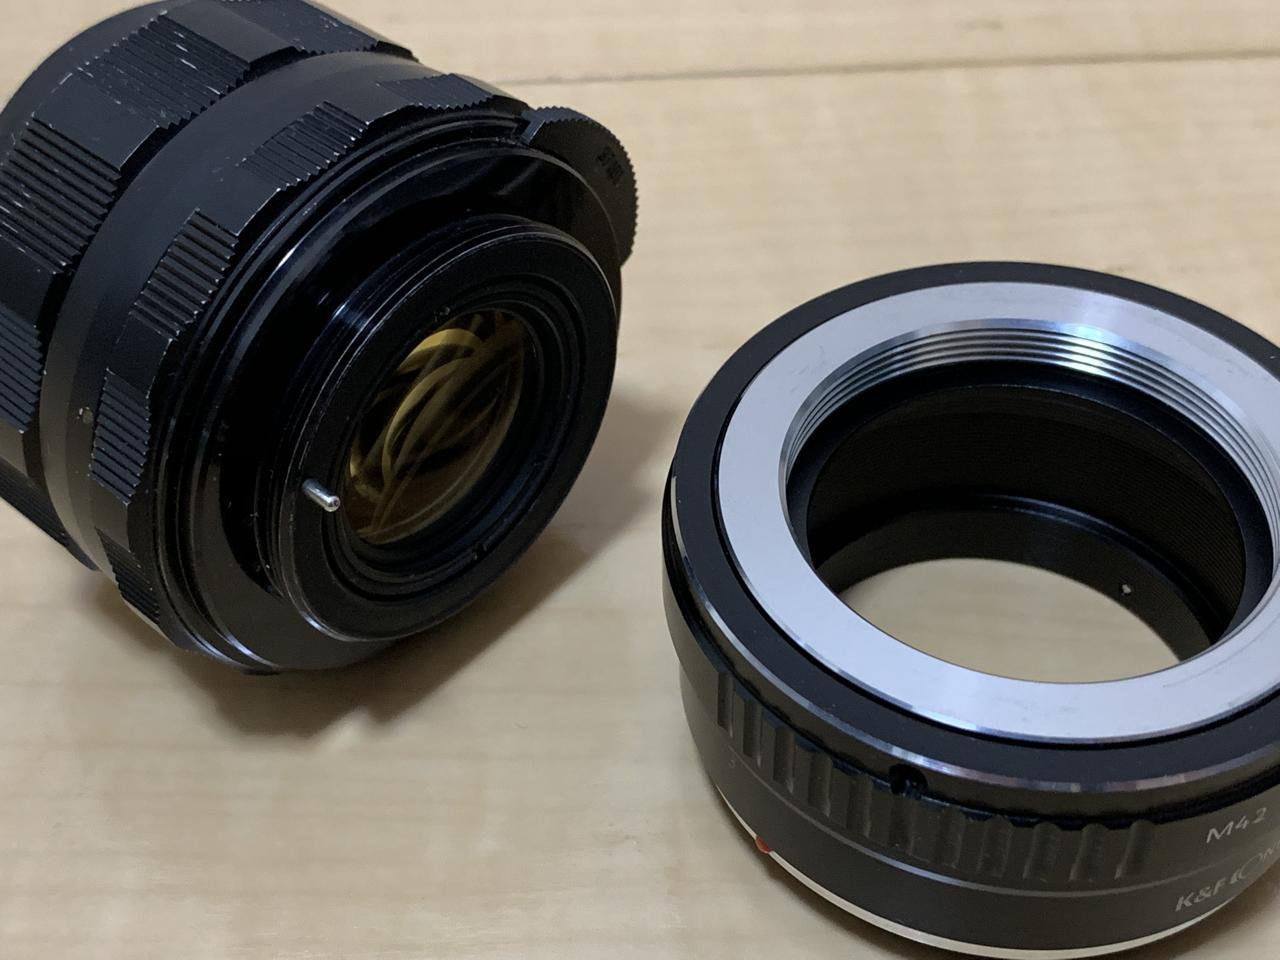 SuperTakumar 55mmf1.8 M42マウント